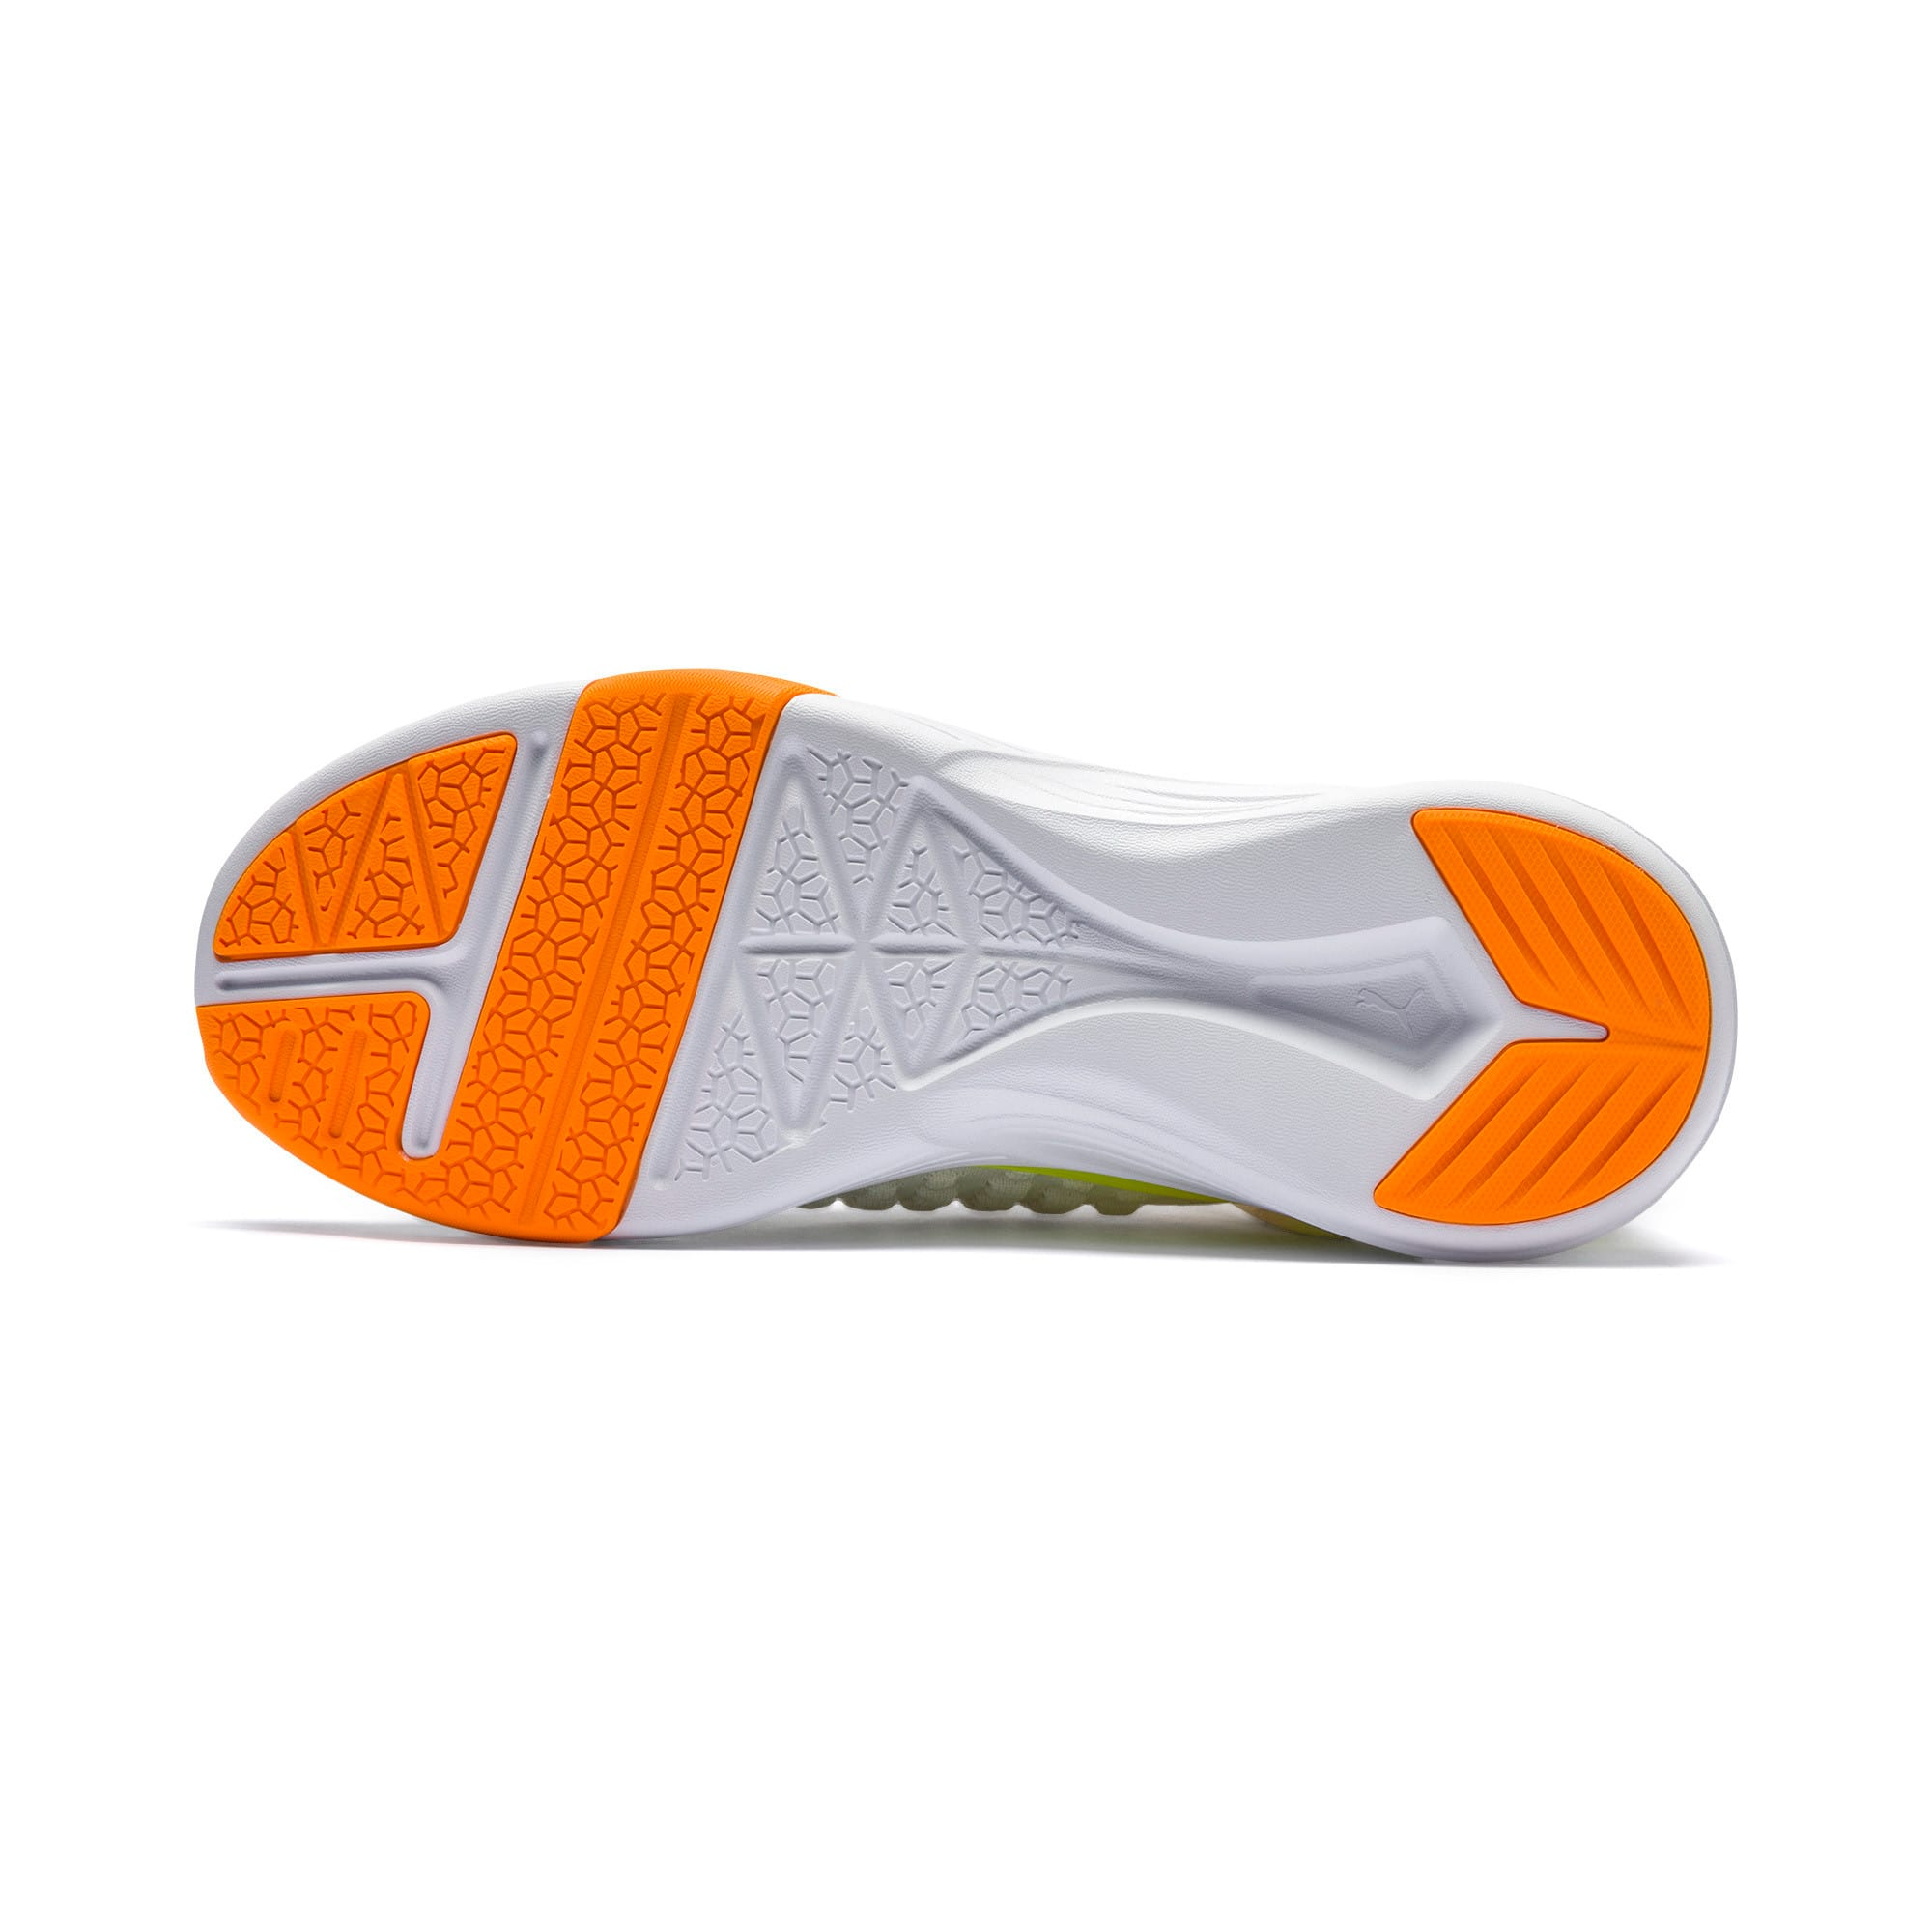 Thumbnail 3 of Mantra Daylight Men's Training Shoes, Vaporous Gray-Puma White, medium